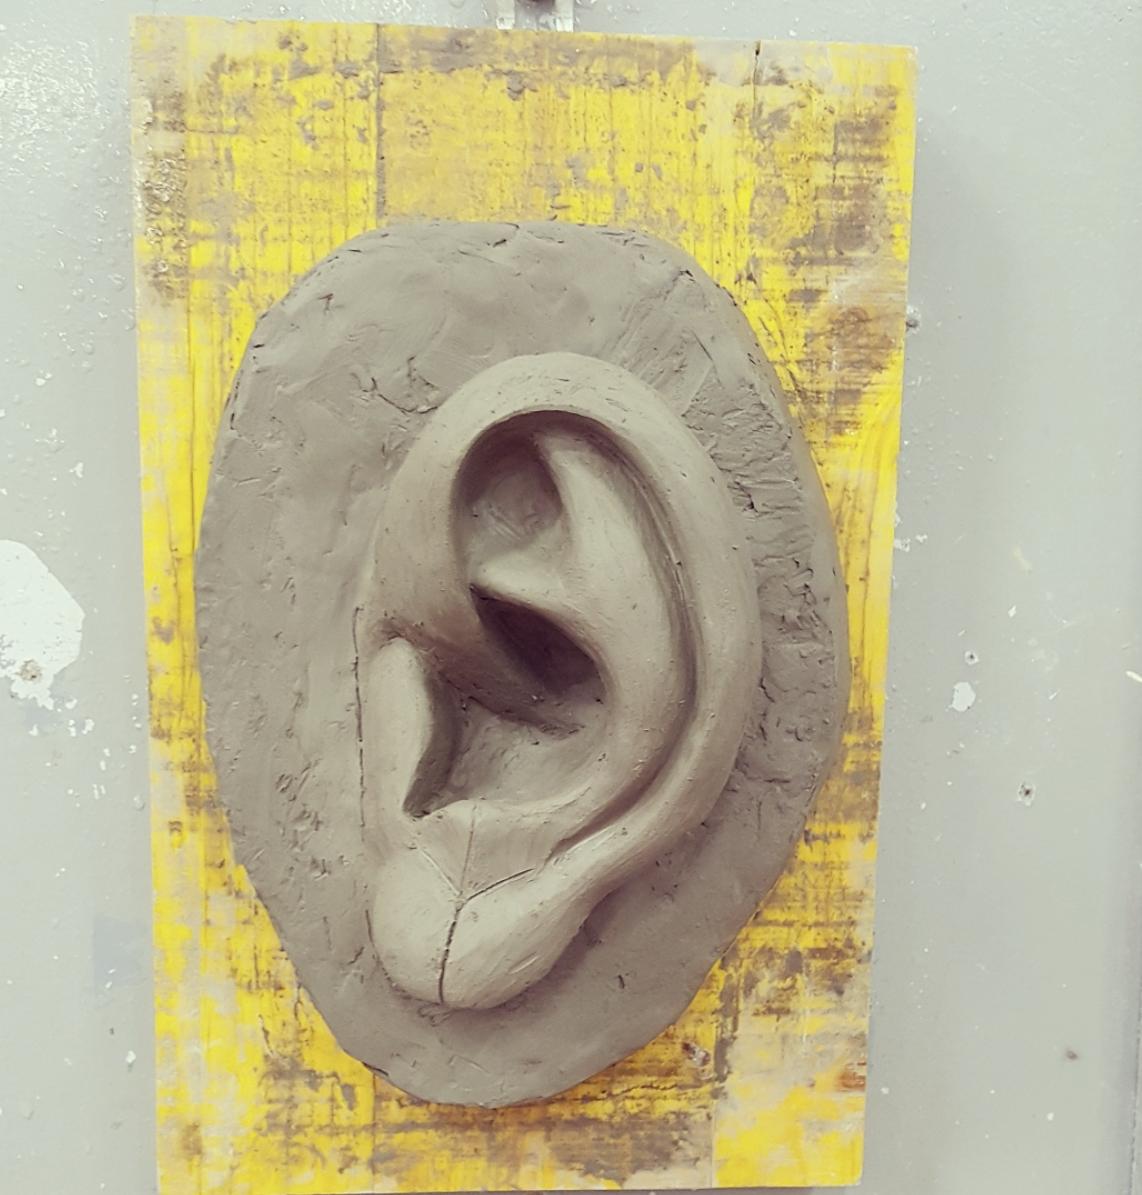 Copy of Michelangelo's David Ear